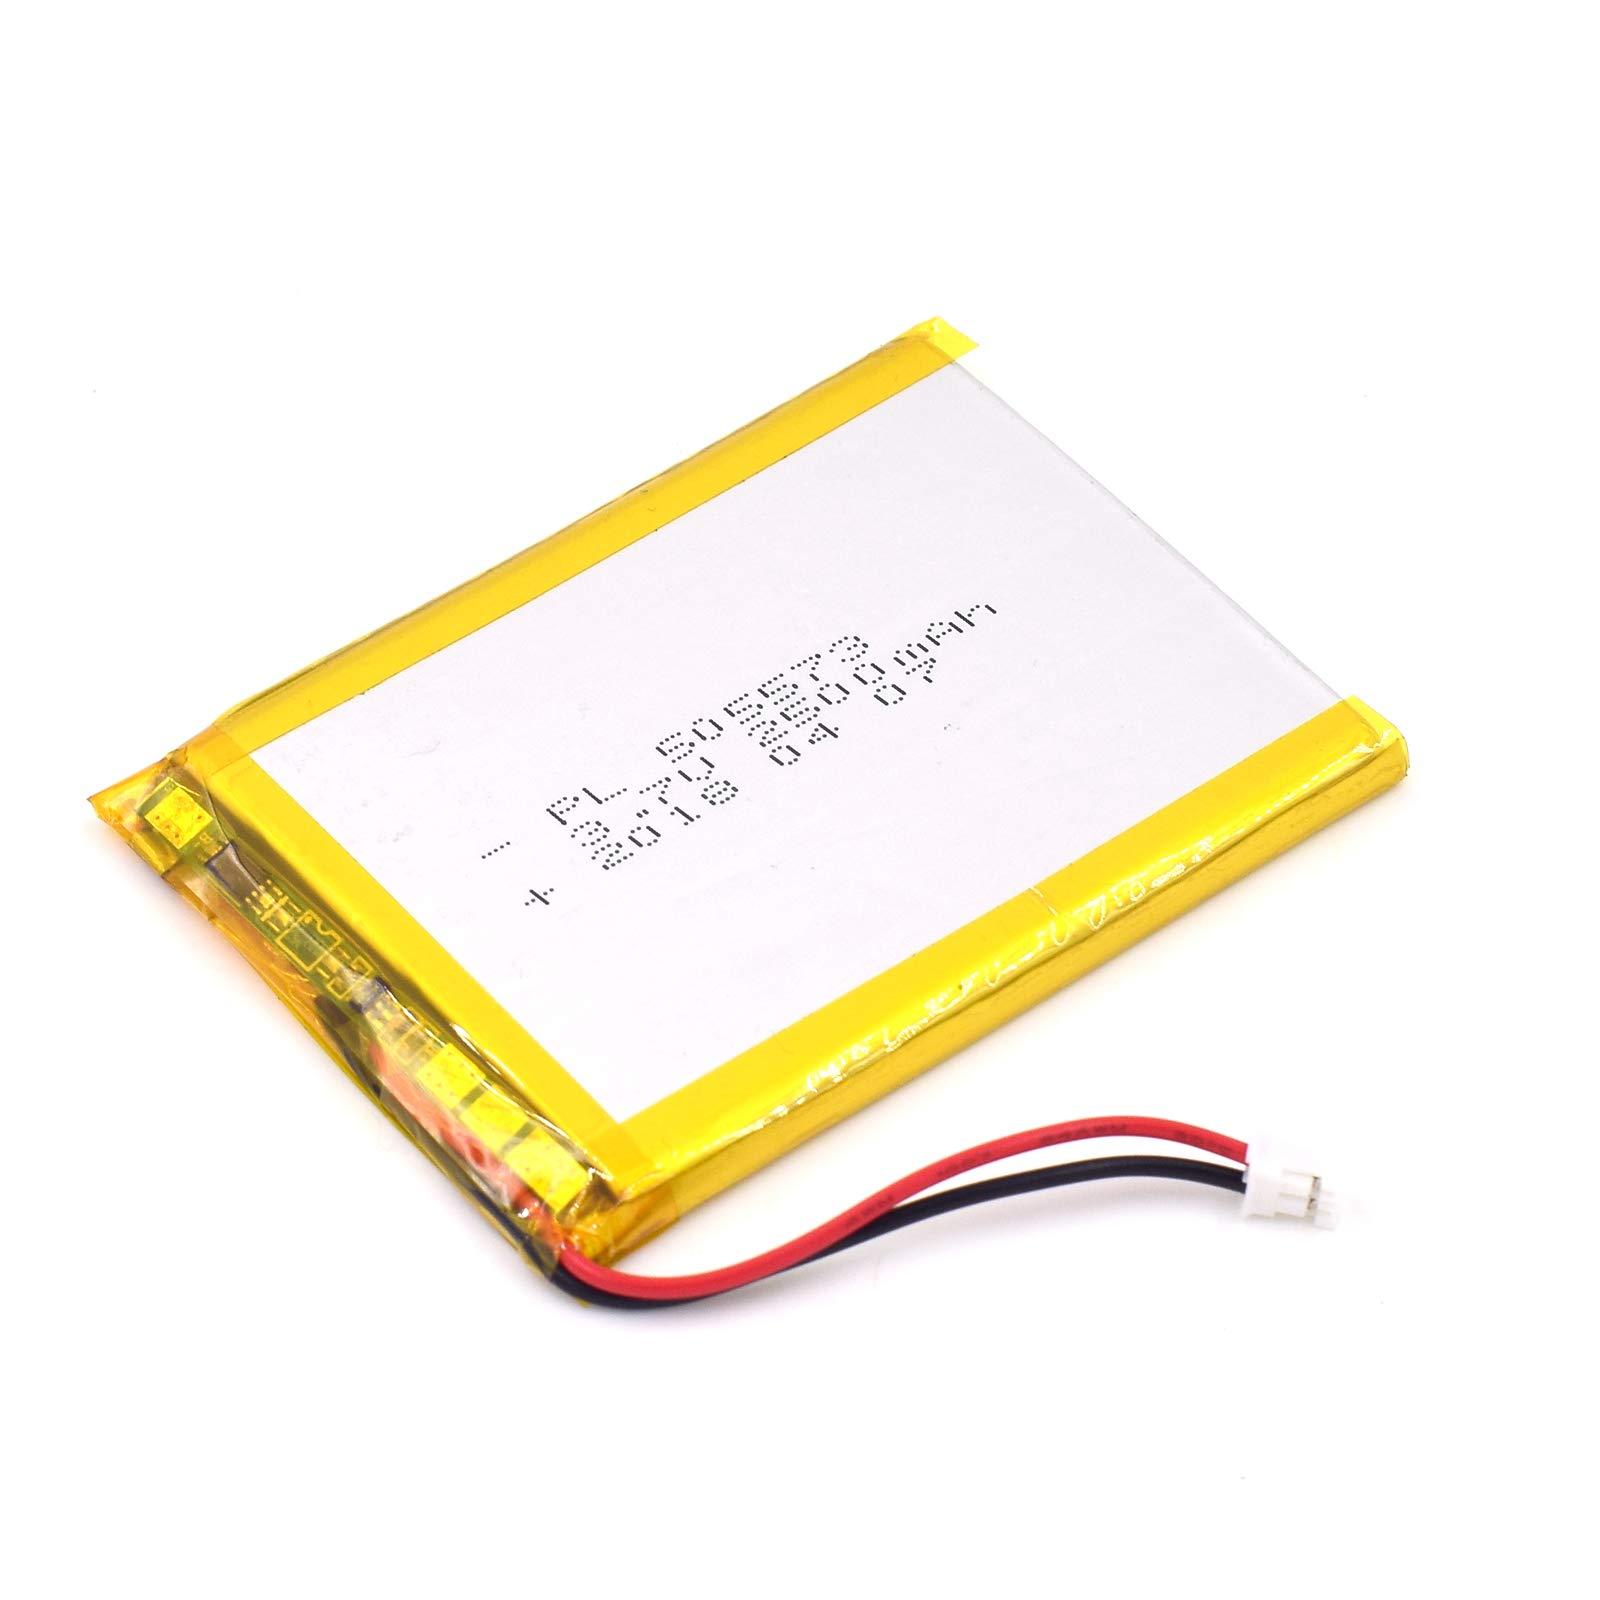 Bateria Lipo 3.7V 2500mAh 505573 Recargable JST Conector